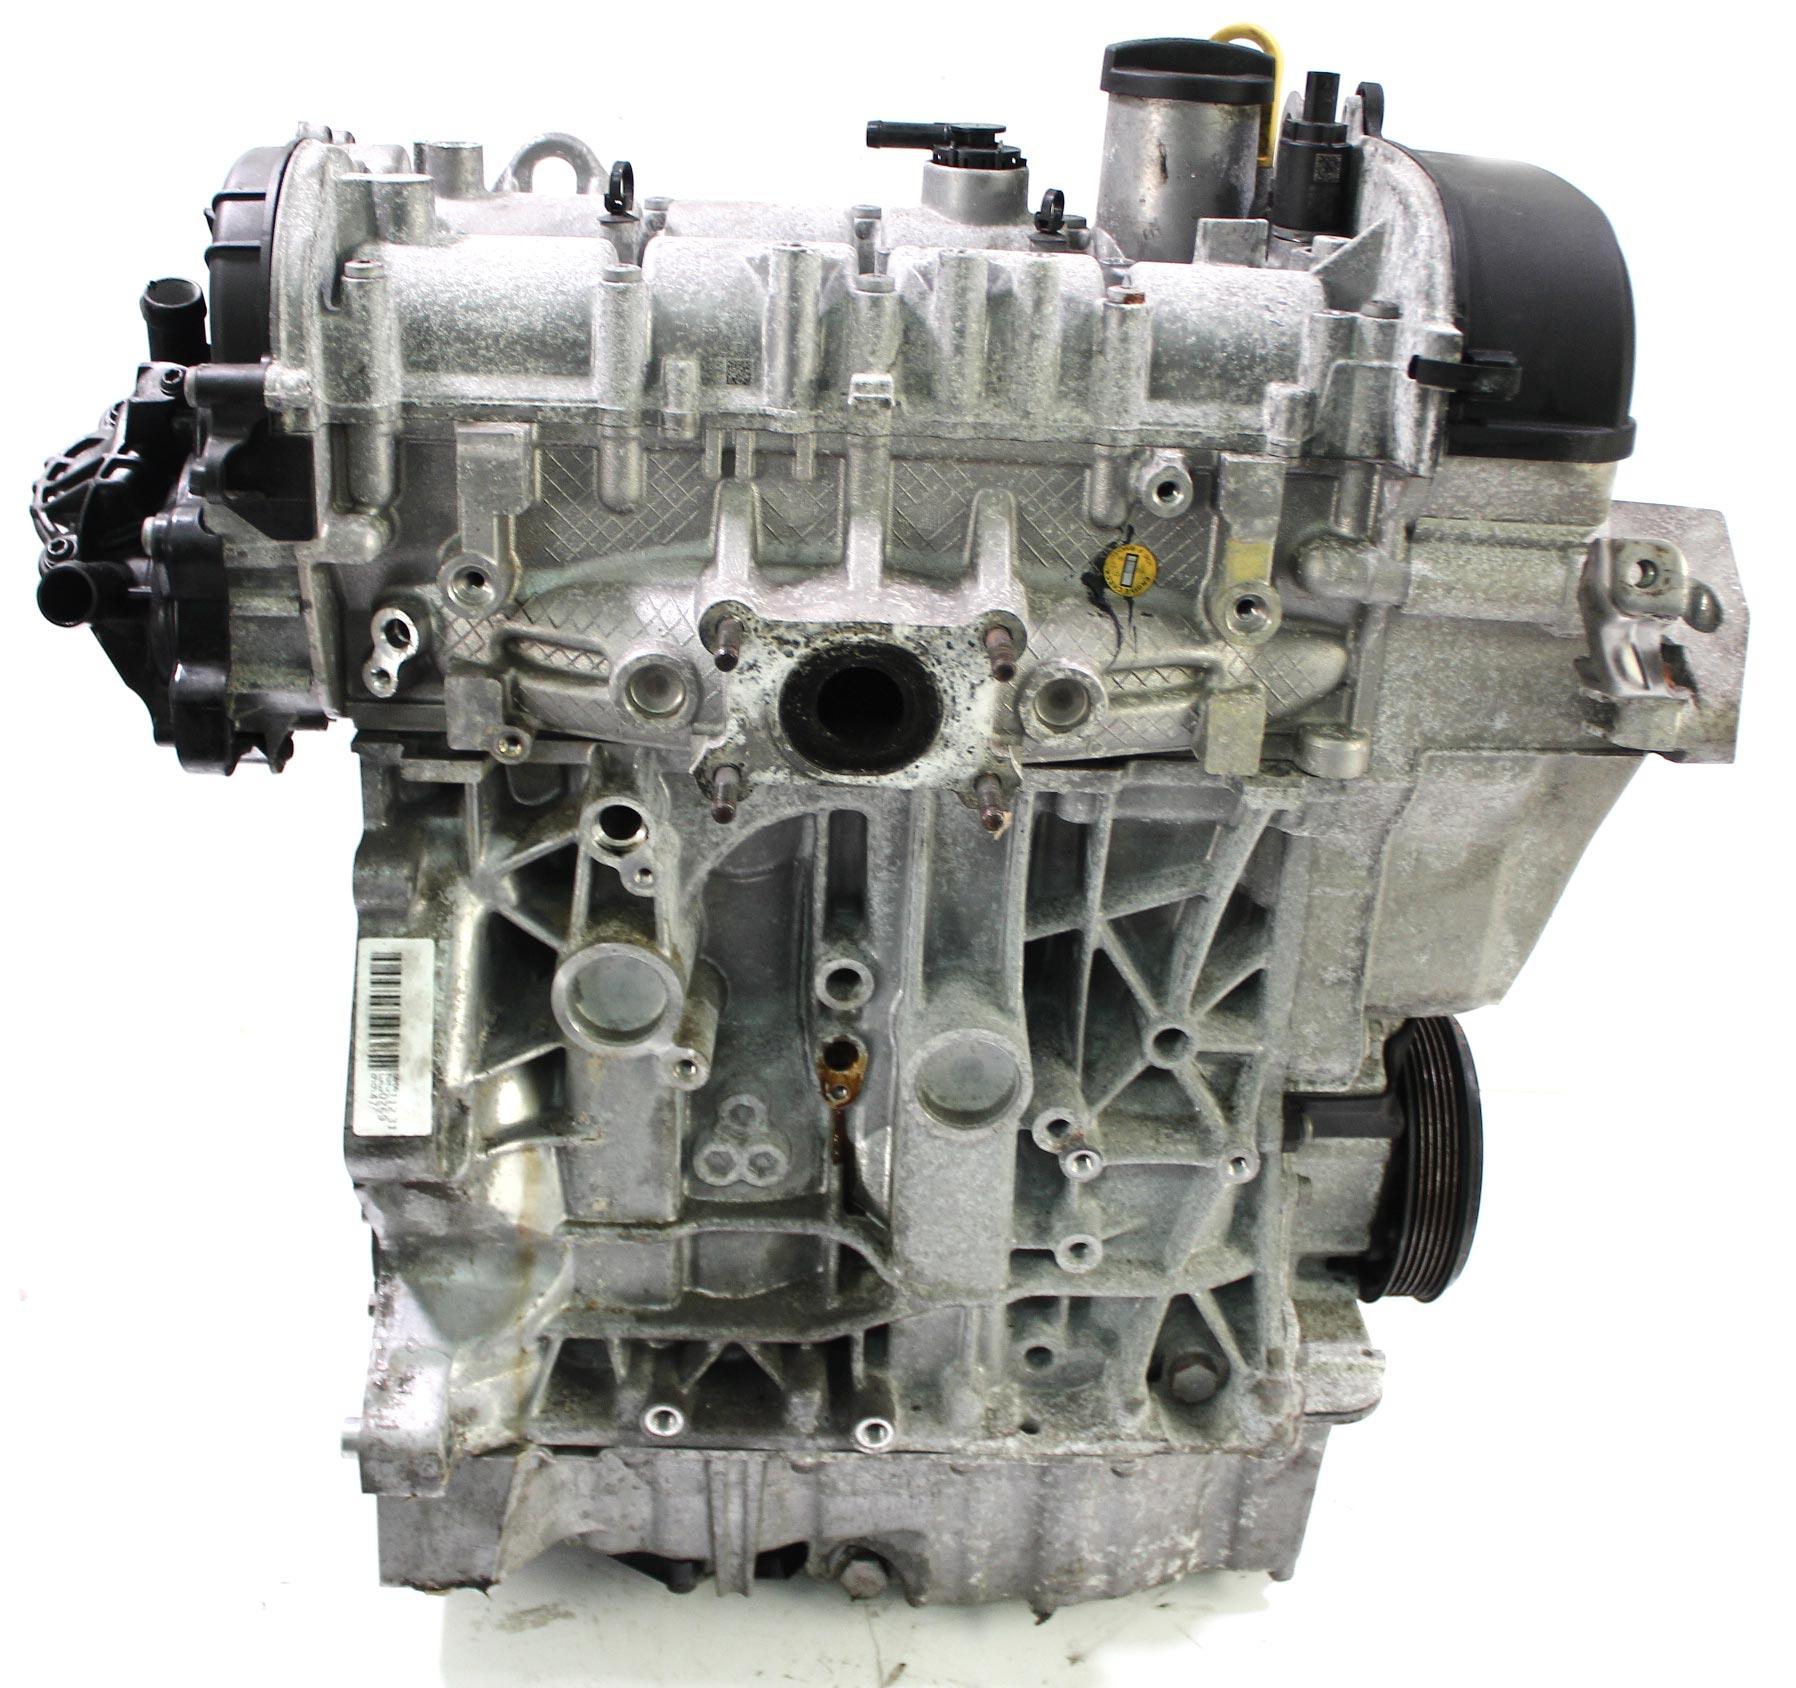 Motor 2015 Audi Seat Skoda VW A3 Leon 1,2 TFSI CJZ CJZA CJZB CJZC CJZD